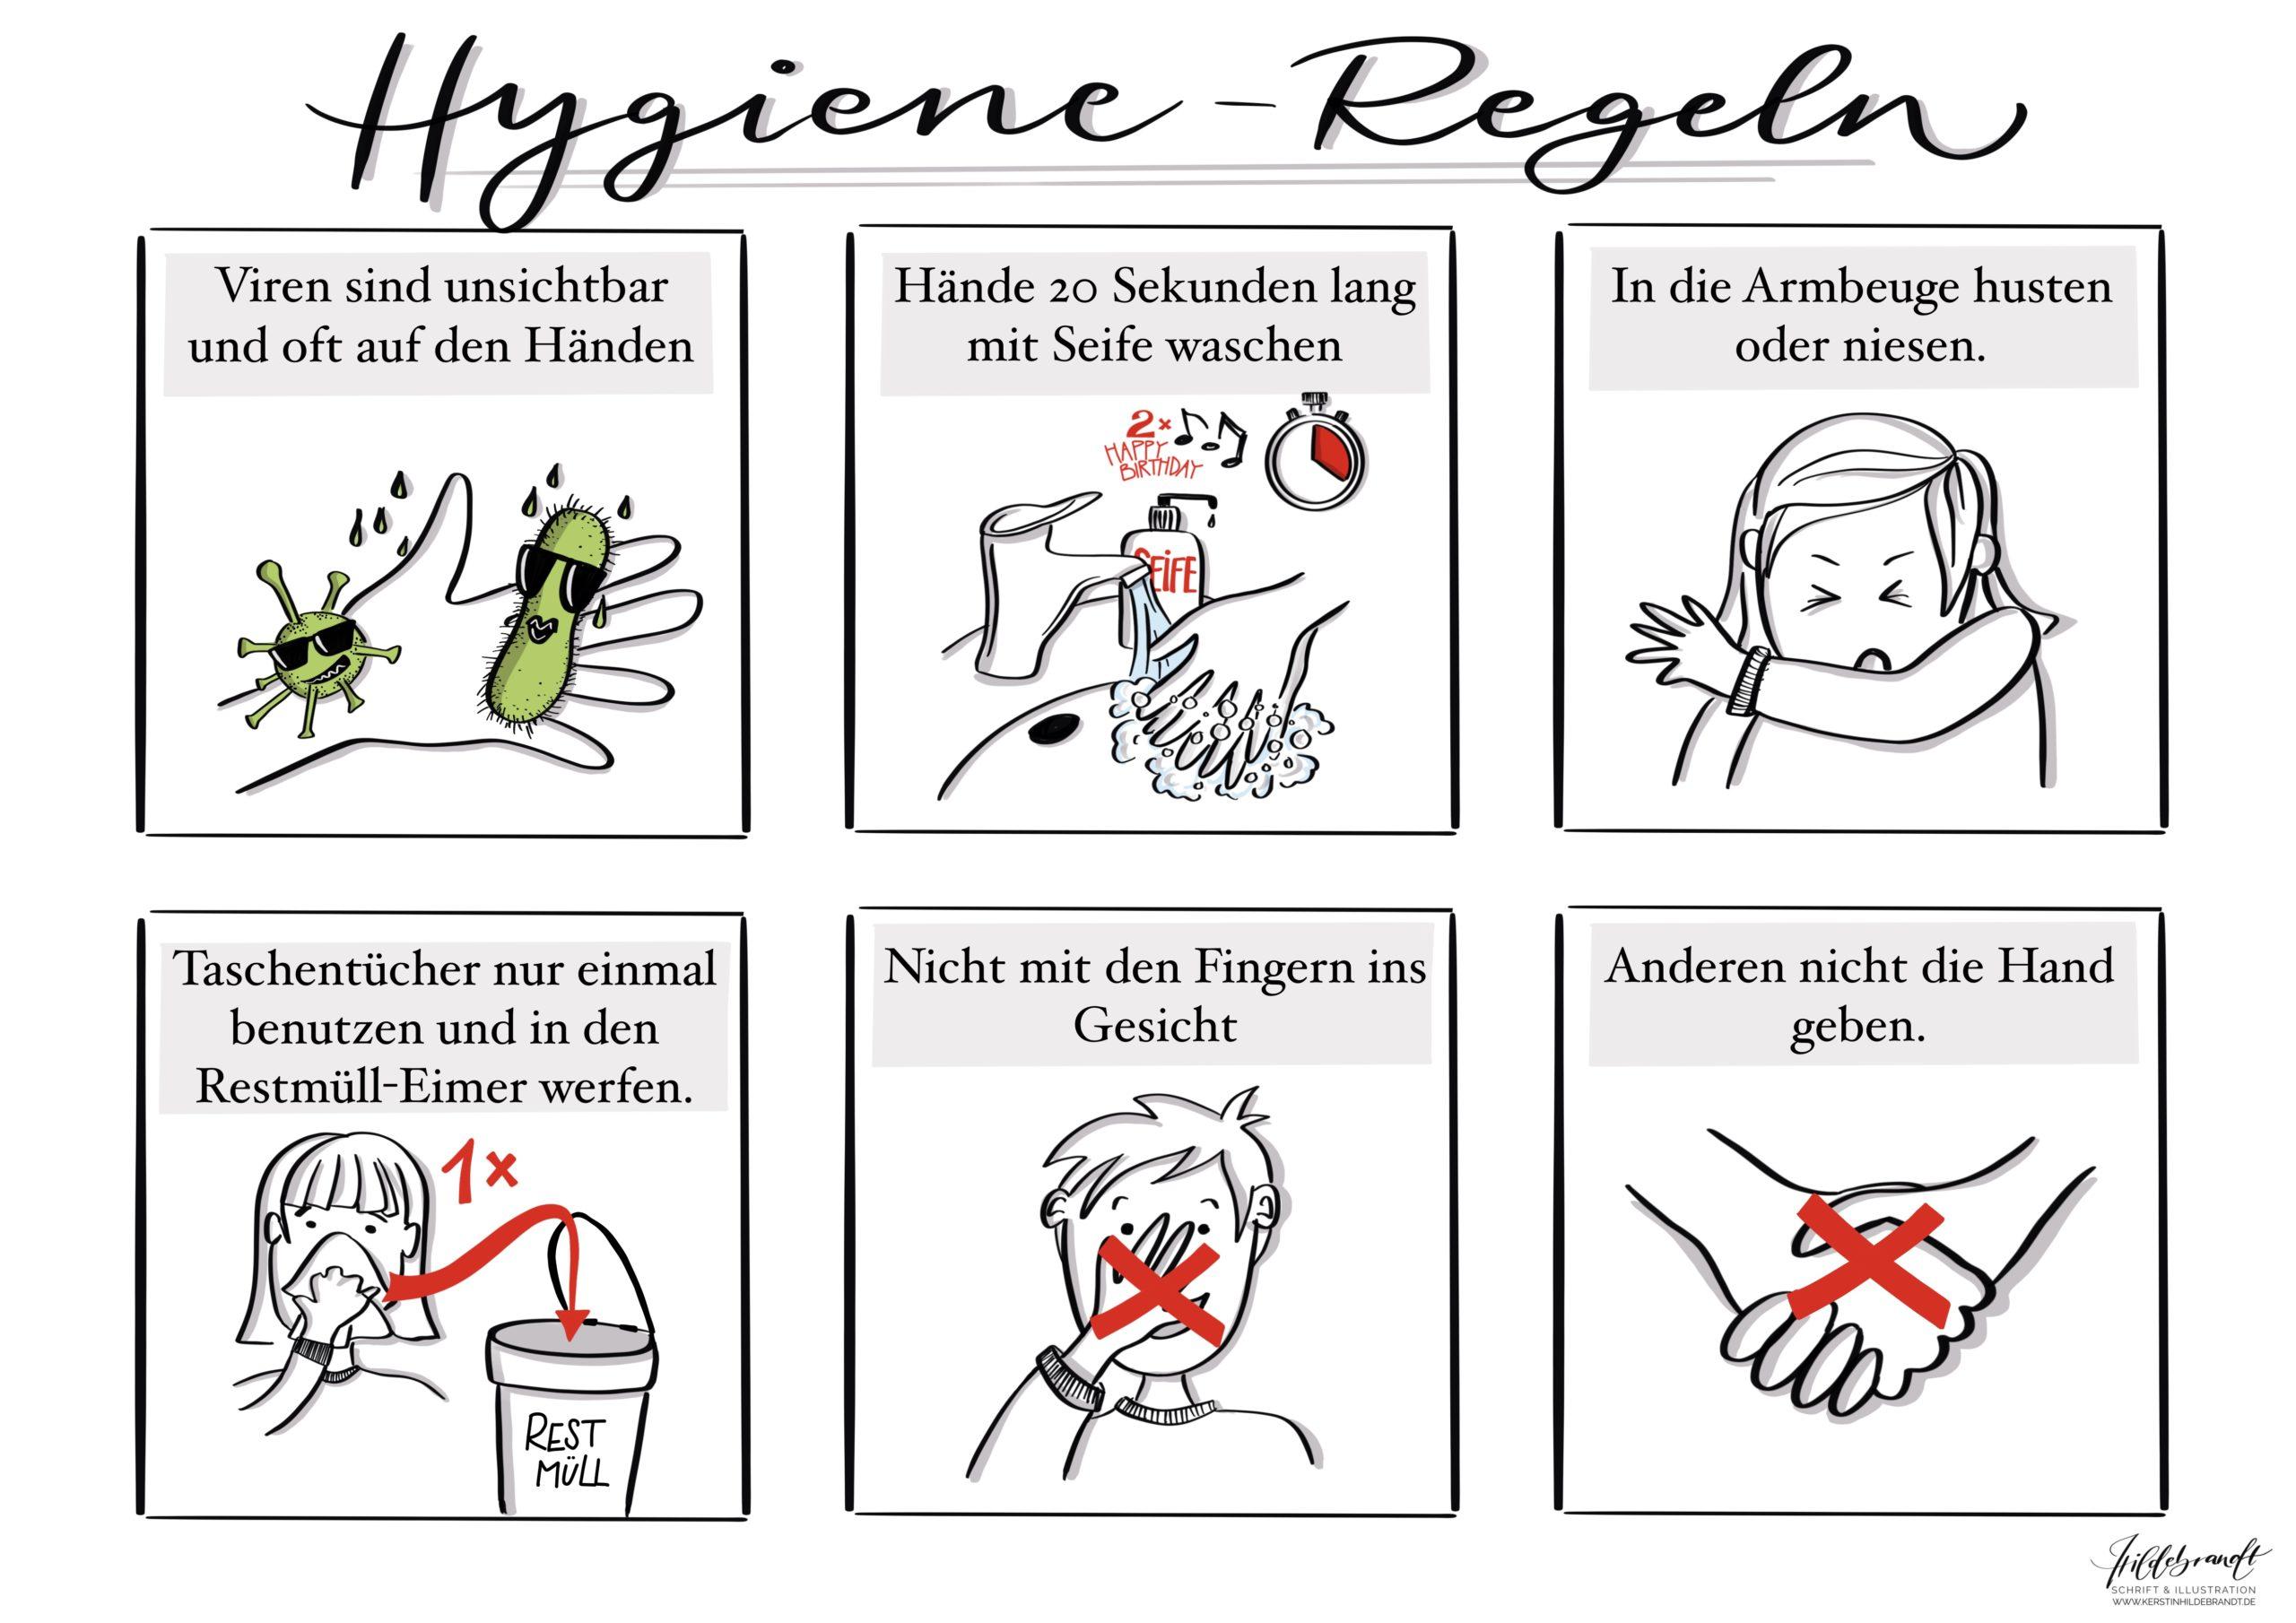 hildebrandt-illustration_hygiene-regeln_sketchnote